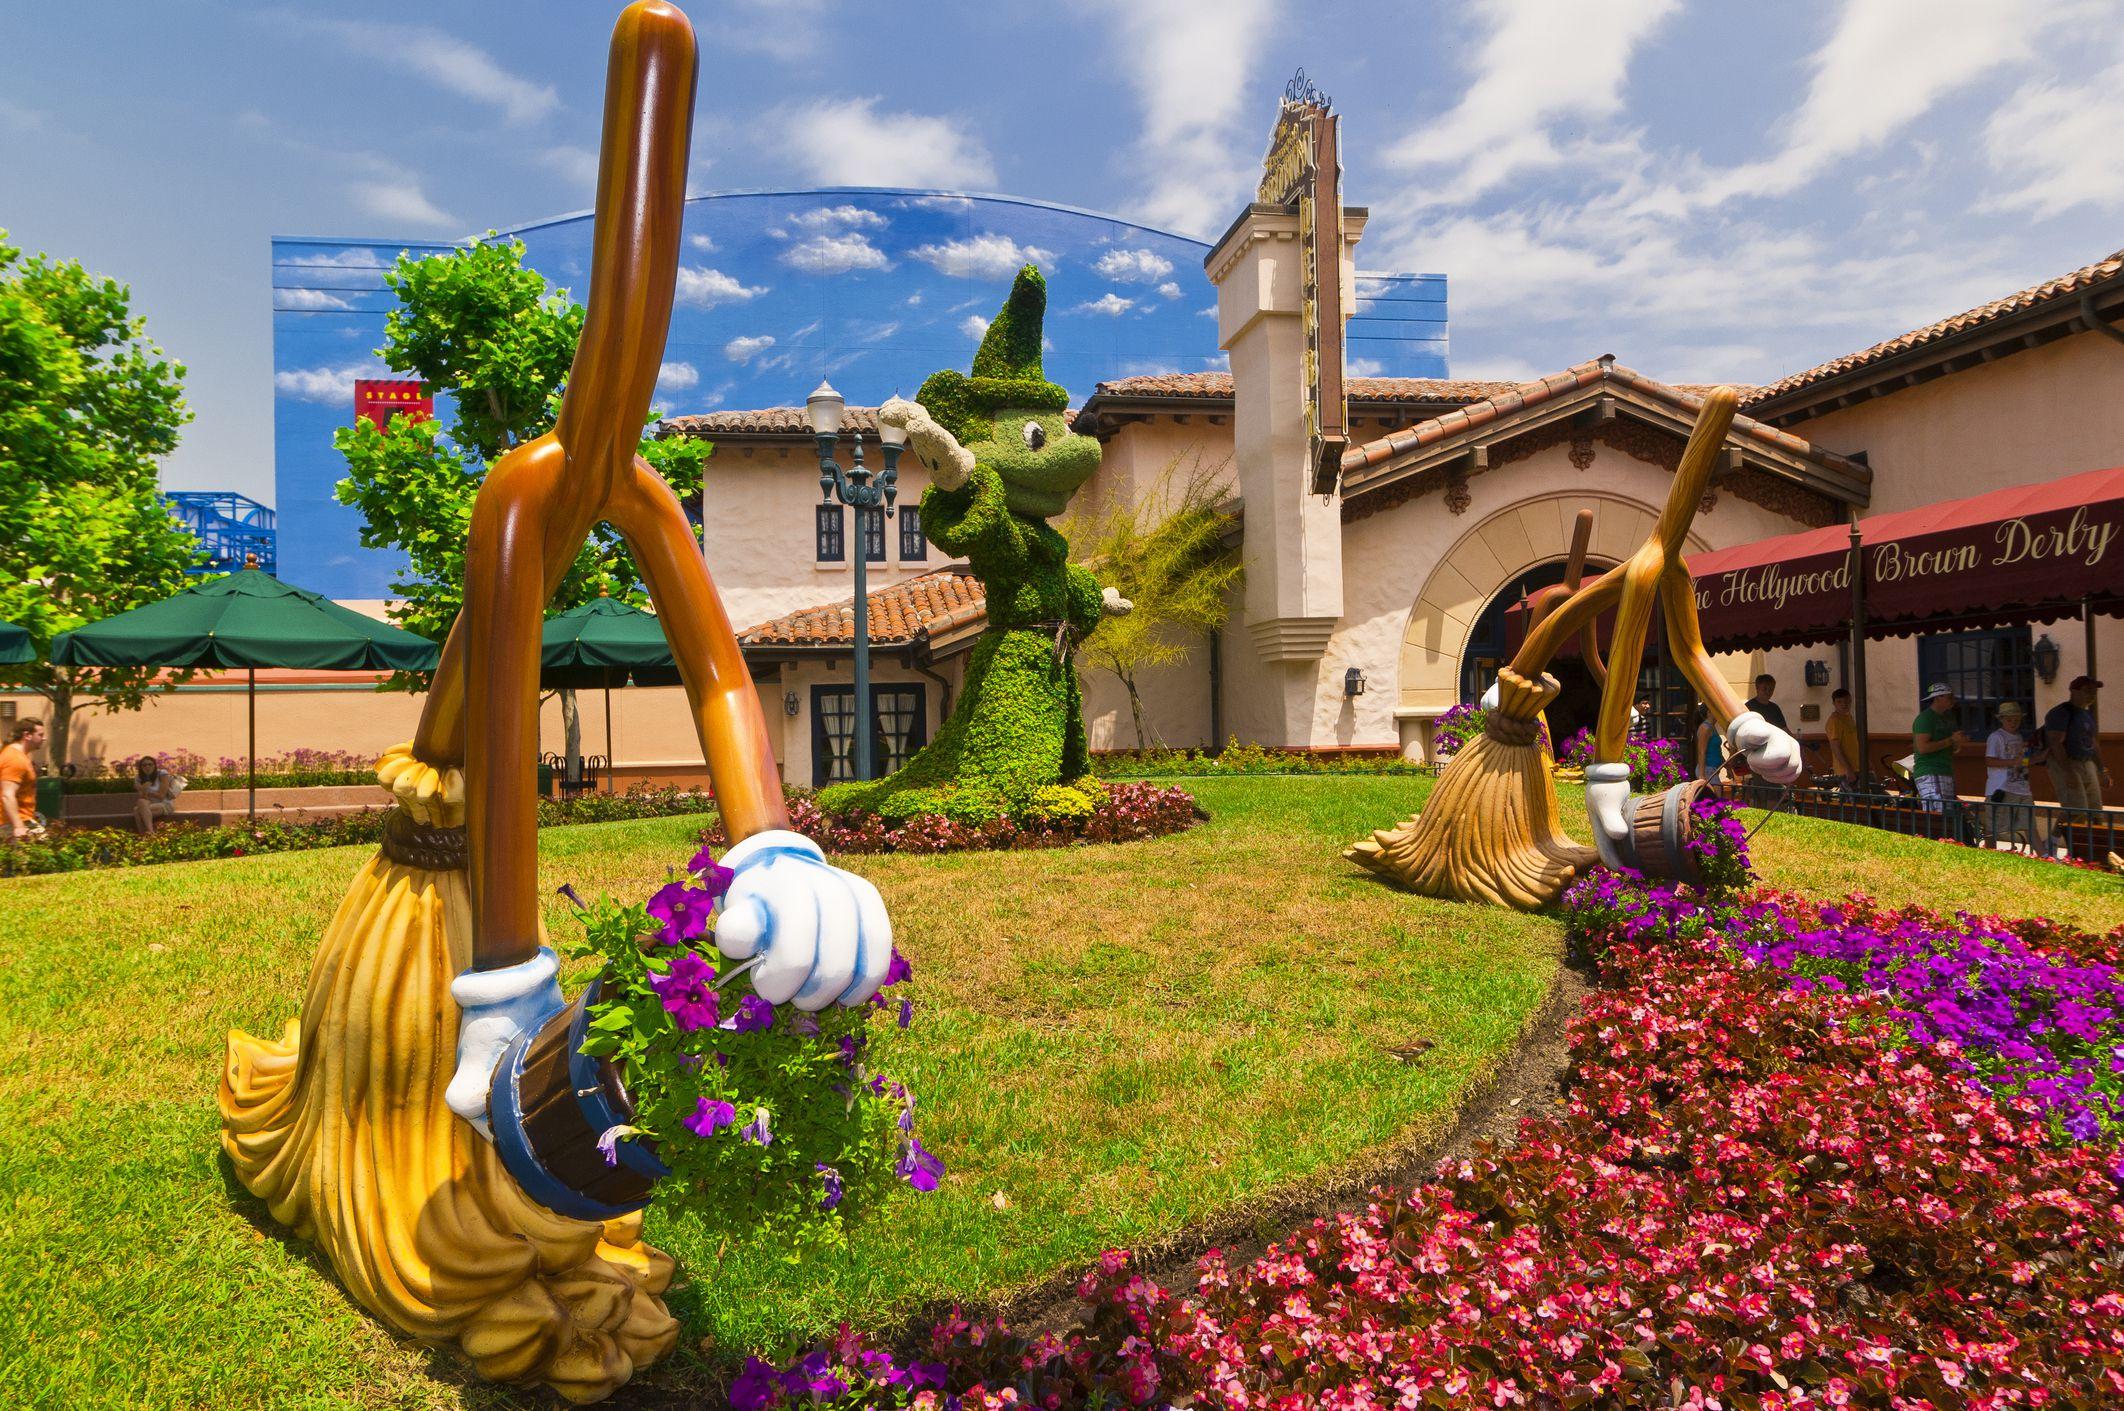 Sorcerer Mickey topiary, Disney's Hollywood Studios, Walt Disney World, Orlando, Florida USA